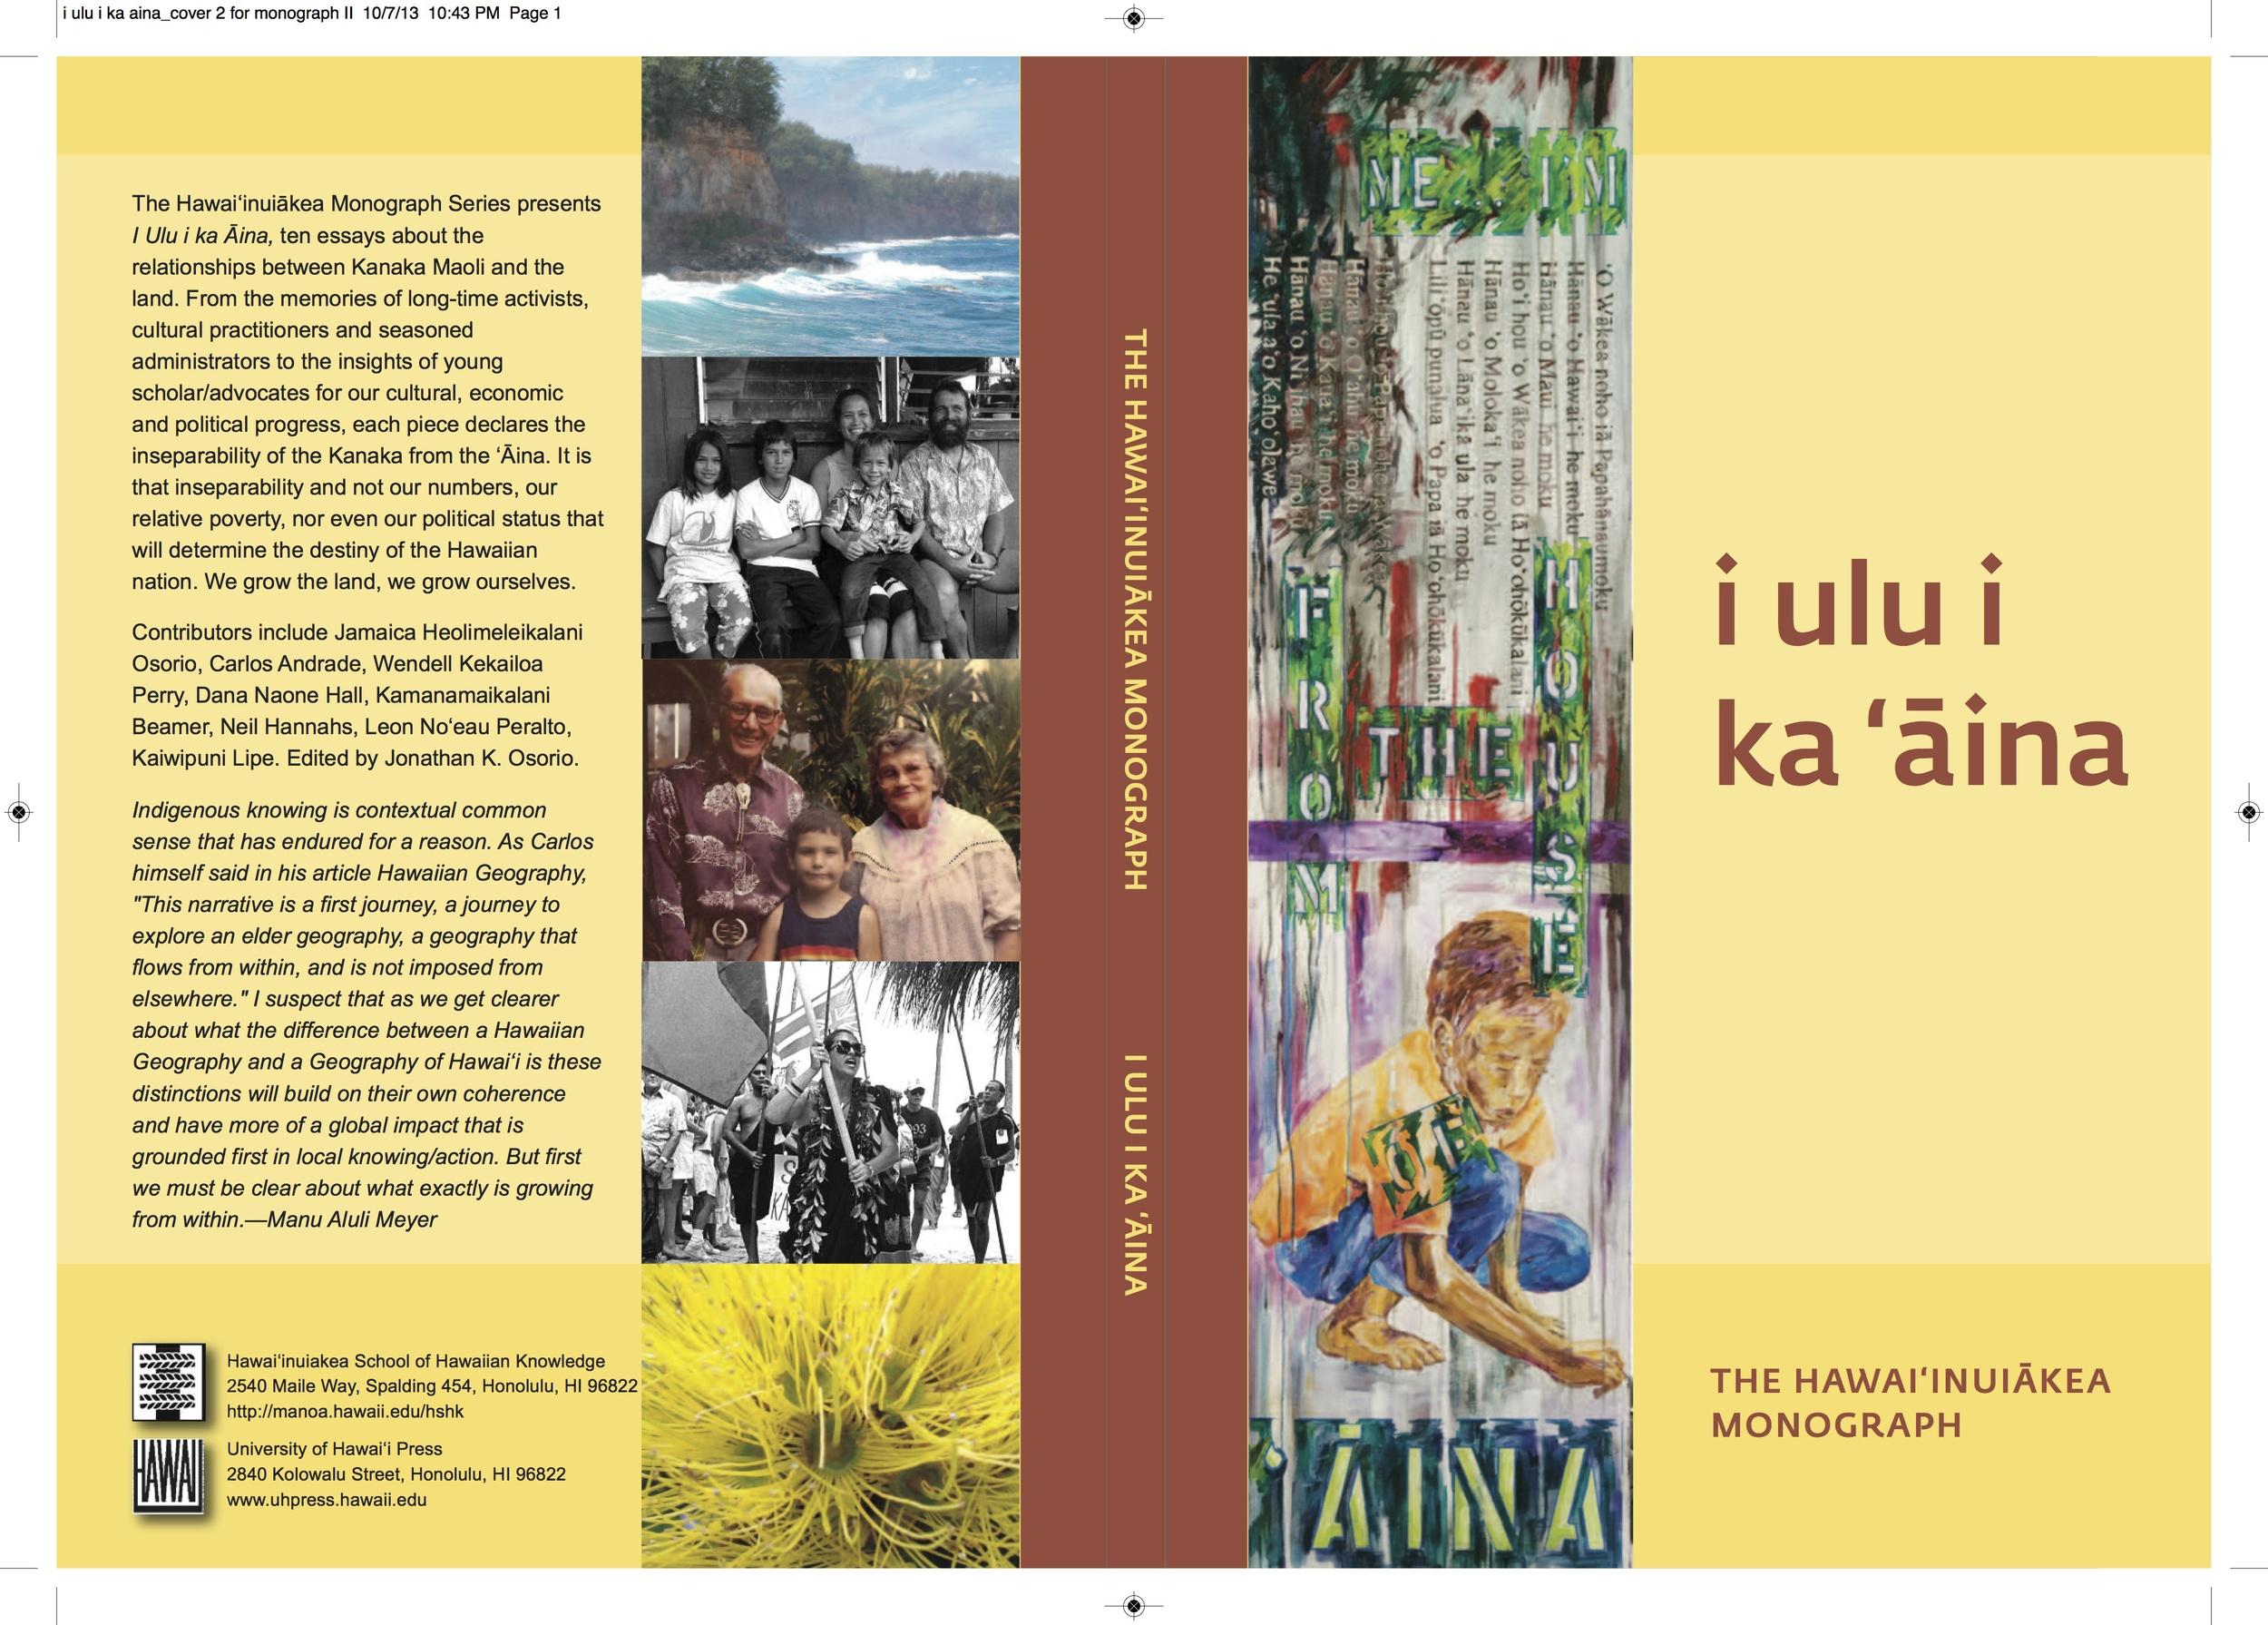 Cover of HSHK monograph